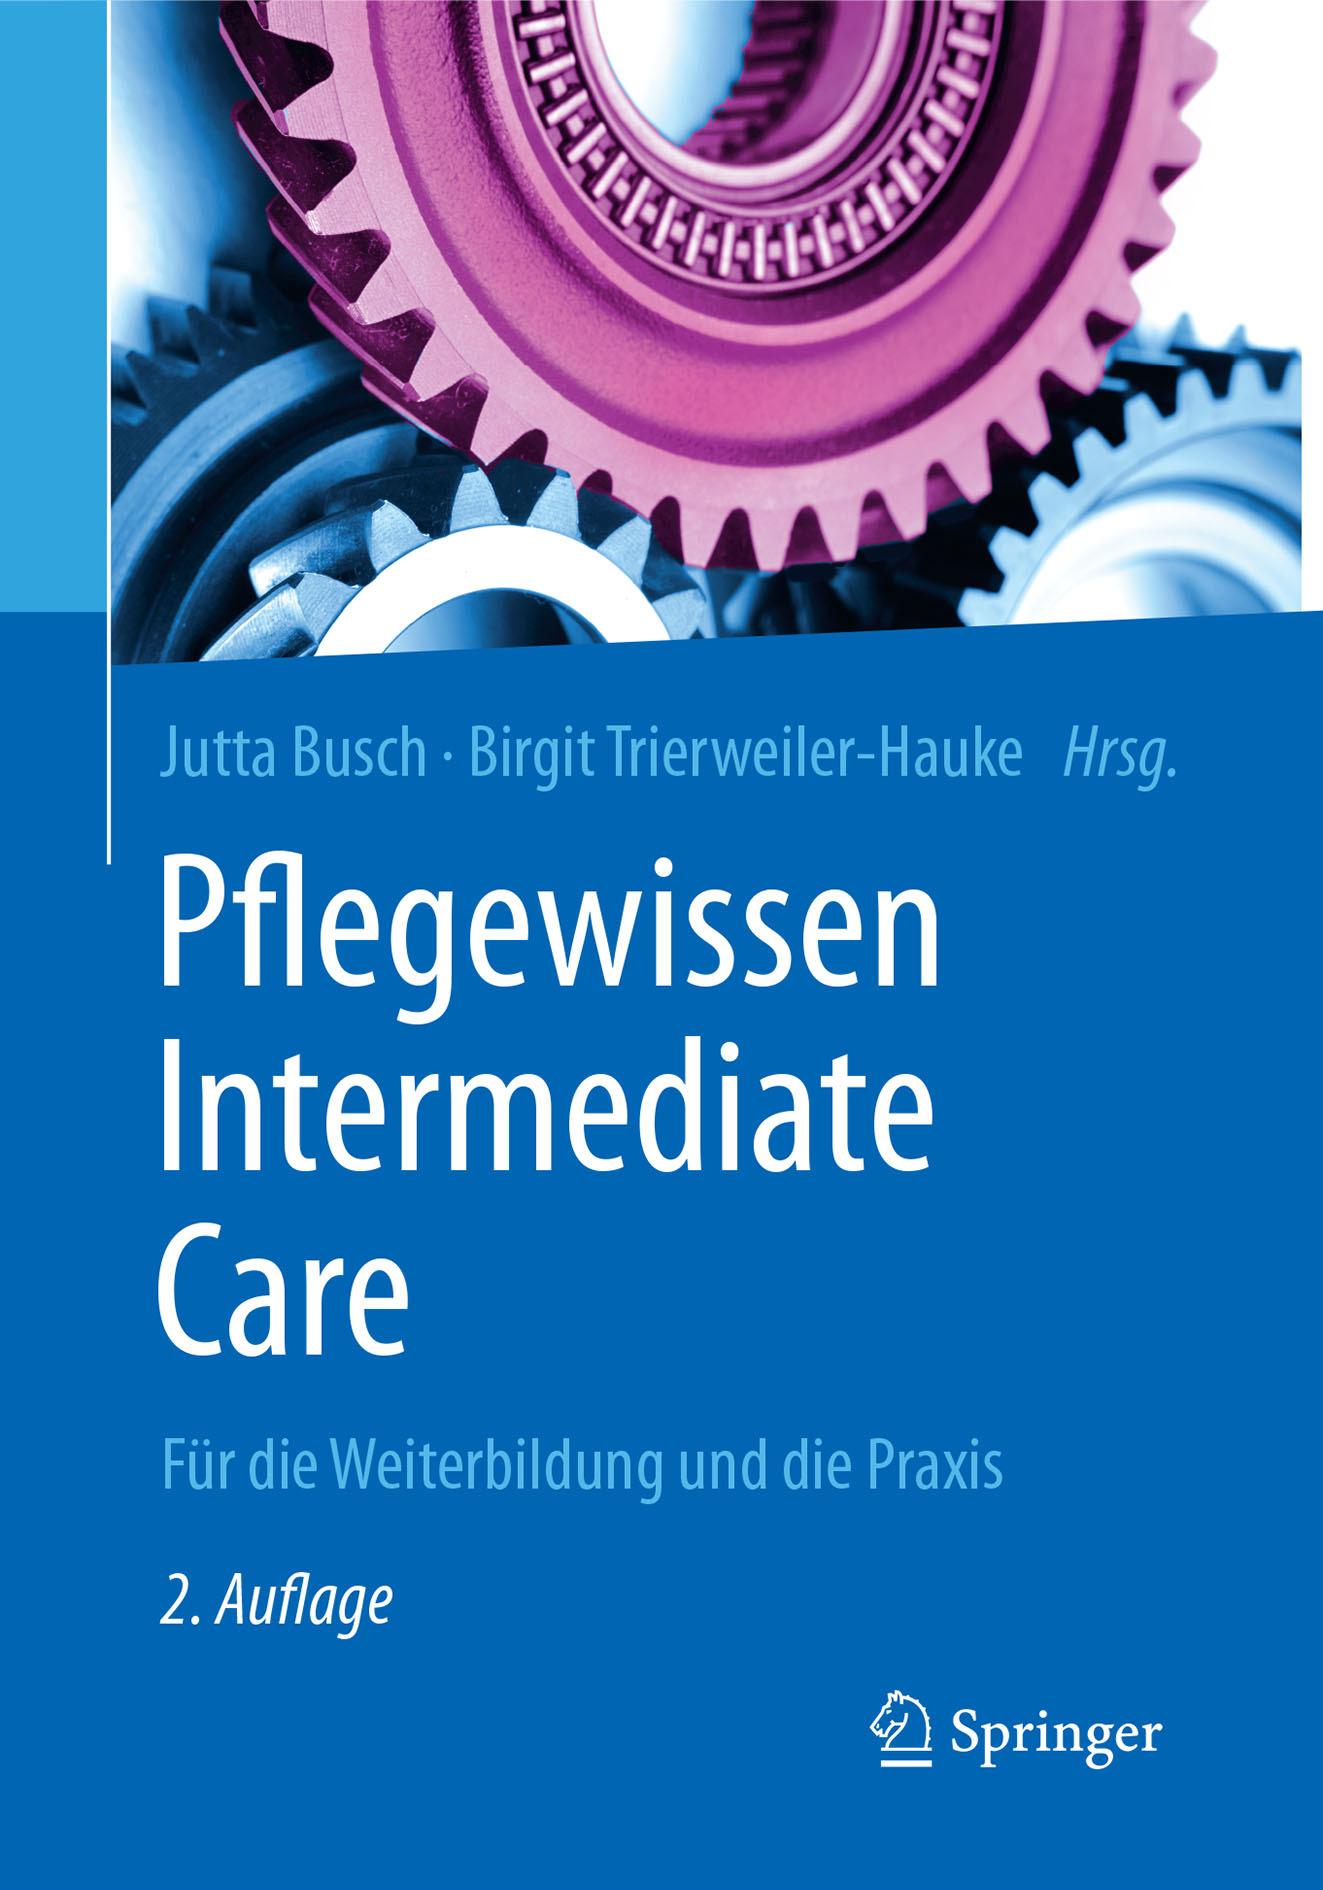 Busch, Jutta - Pflegewissen Intermediate Care, ebook